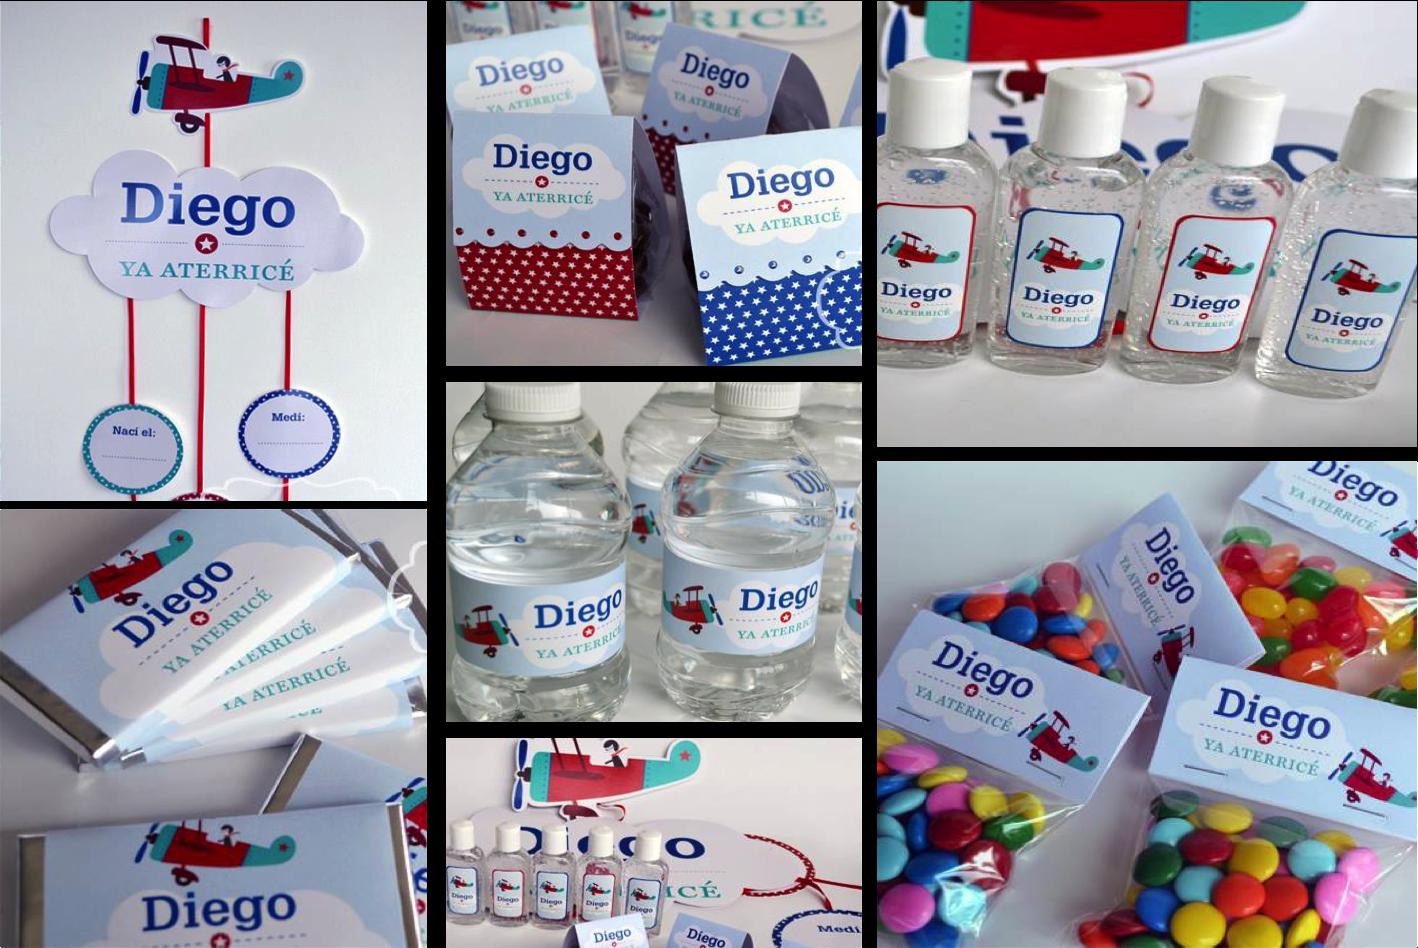 Kit nacimiento Diego.png